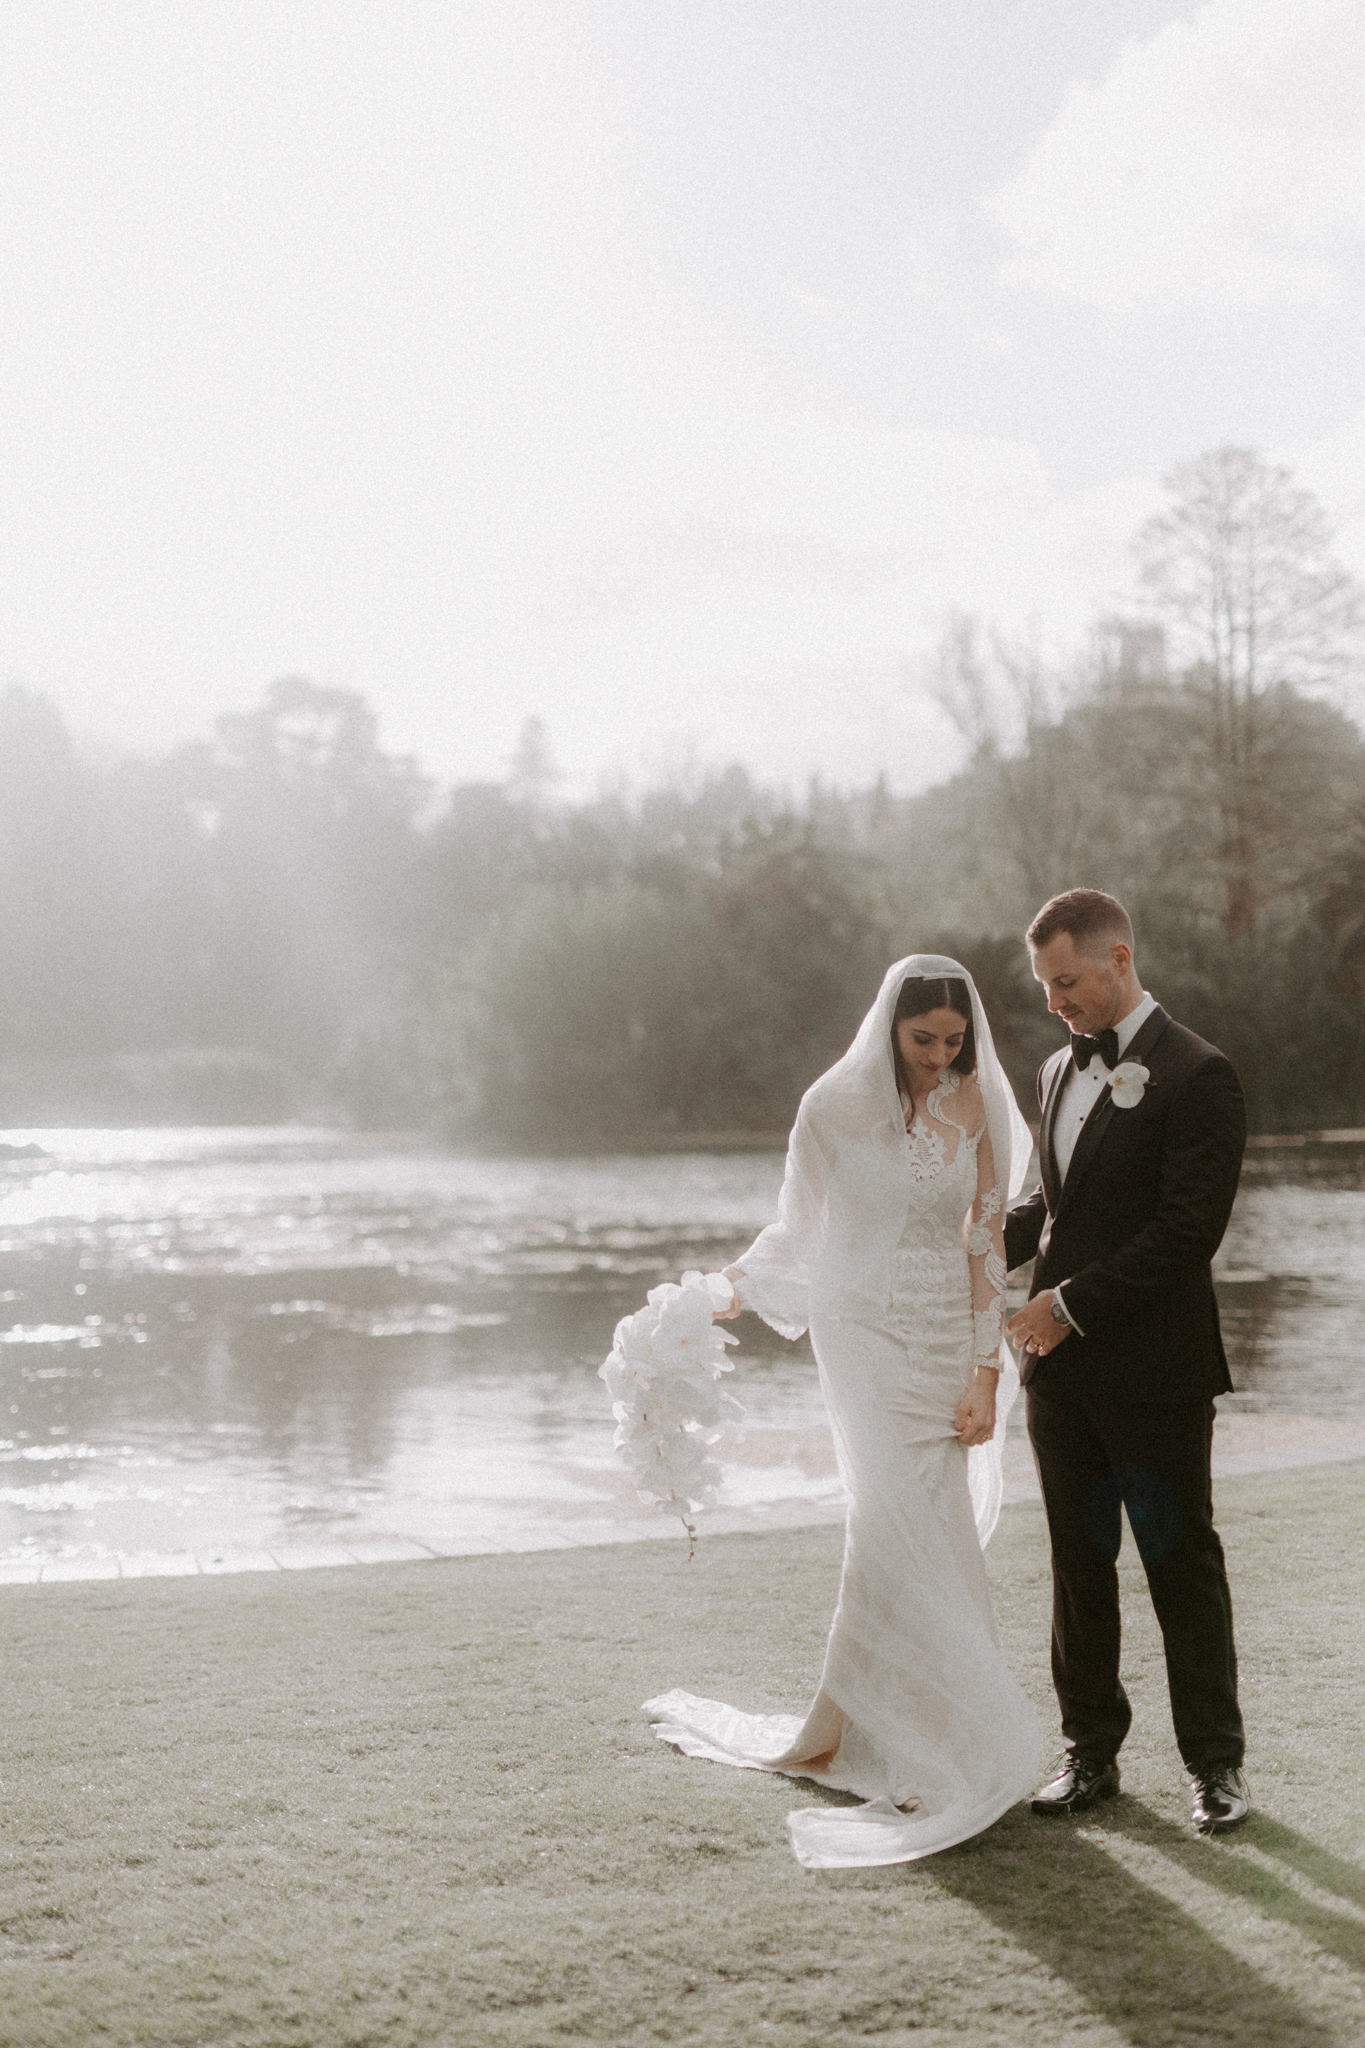 The-Terrace-Royal-Botanic-Gardens-Wedding-Emotions-and-Math-Photography-132.jpg